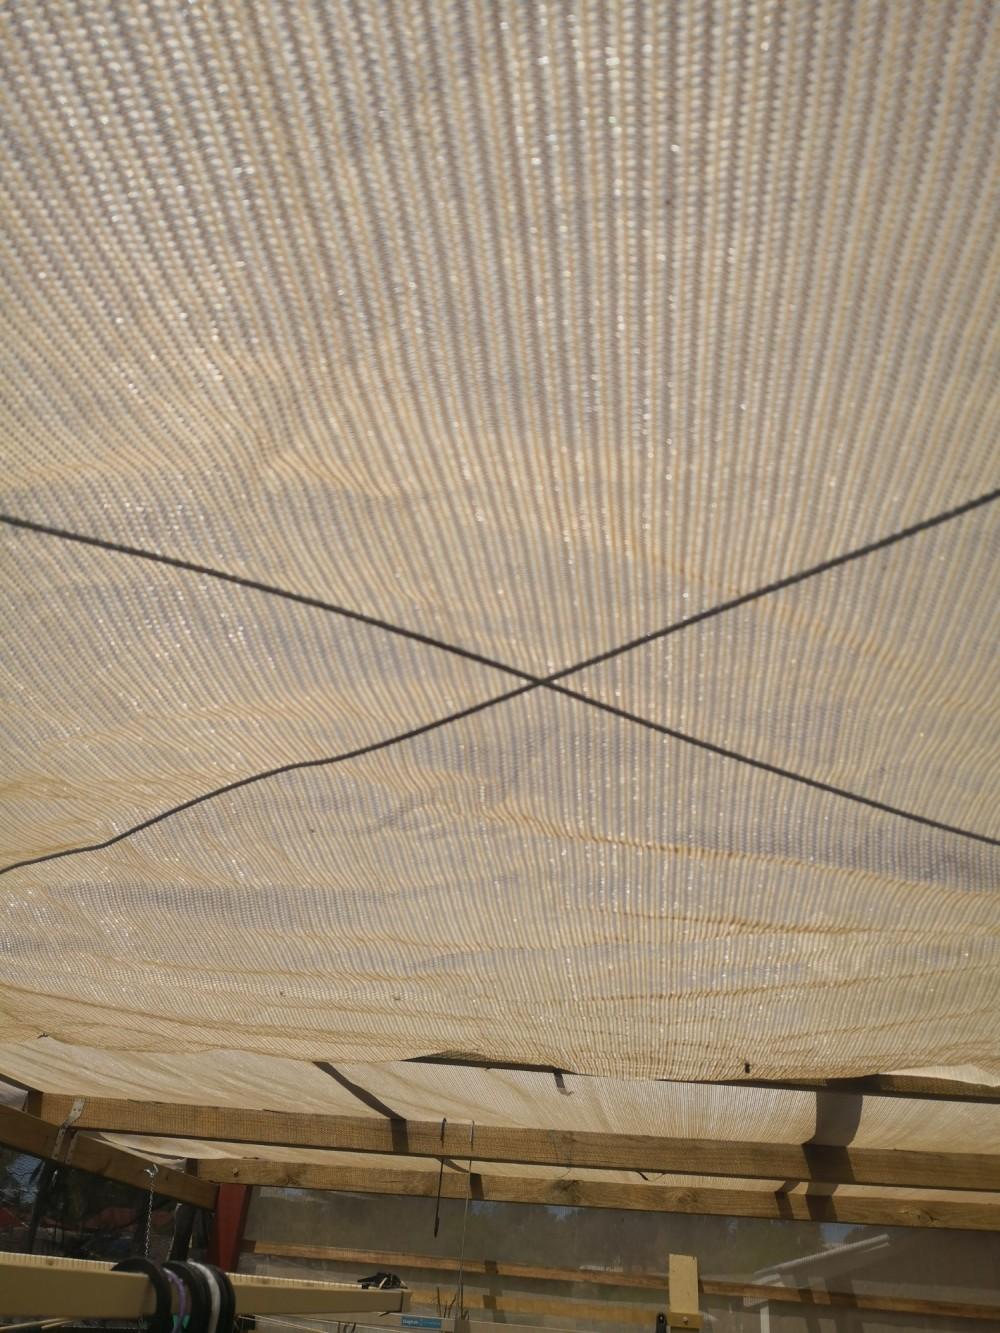 Shadecloth sails